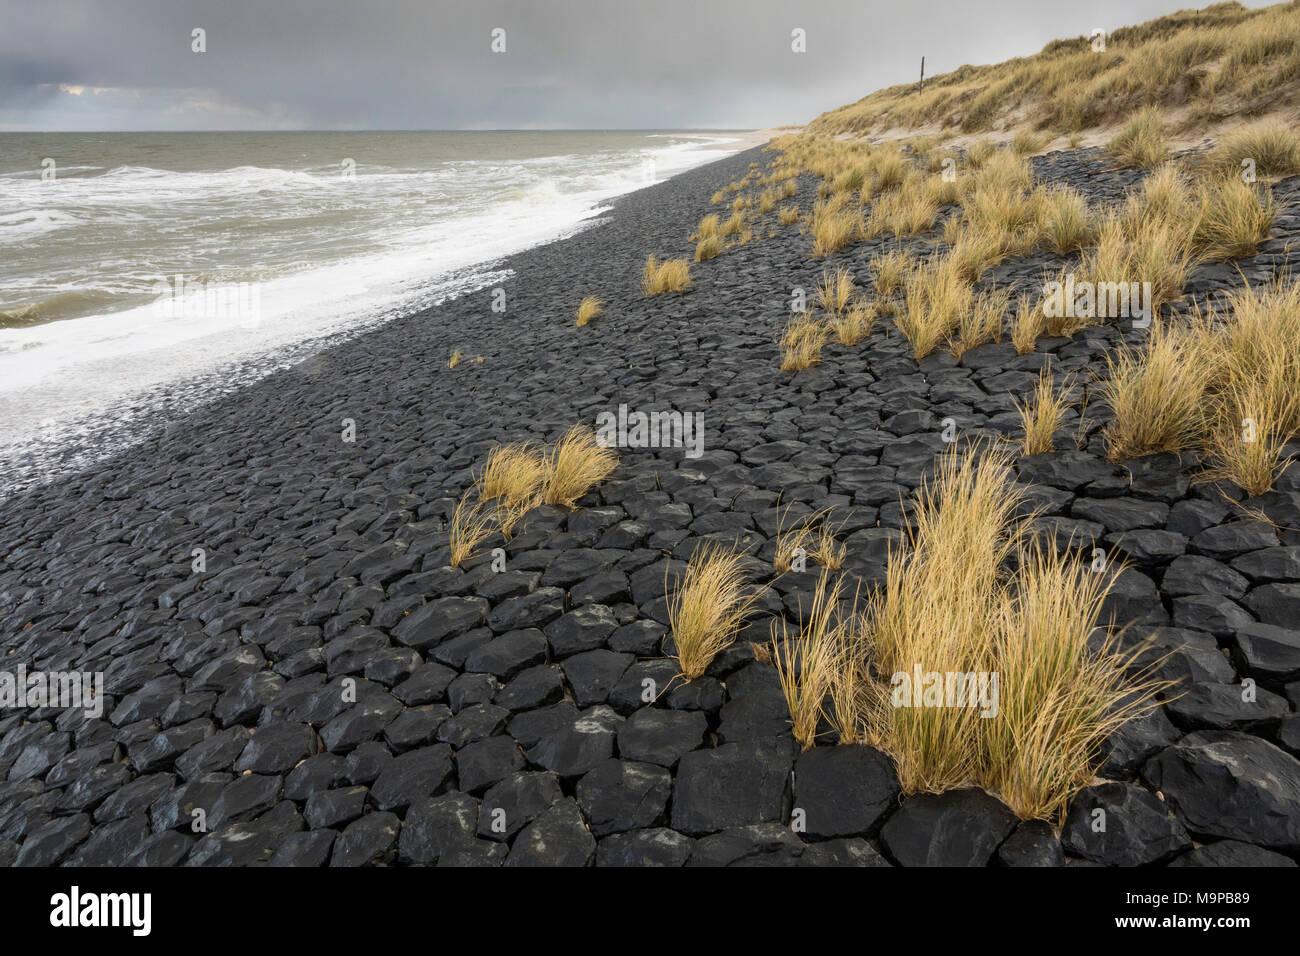 Stony beach, coastal protection, west beach, Sylt, North Frisian island, Schleswig-Holstein, Germany - Stock Image